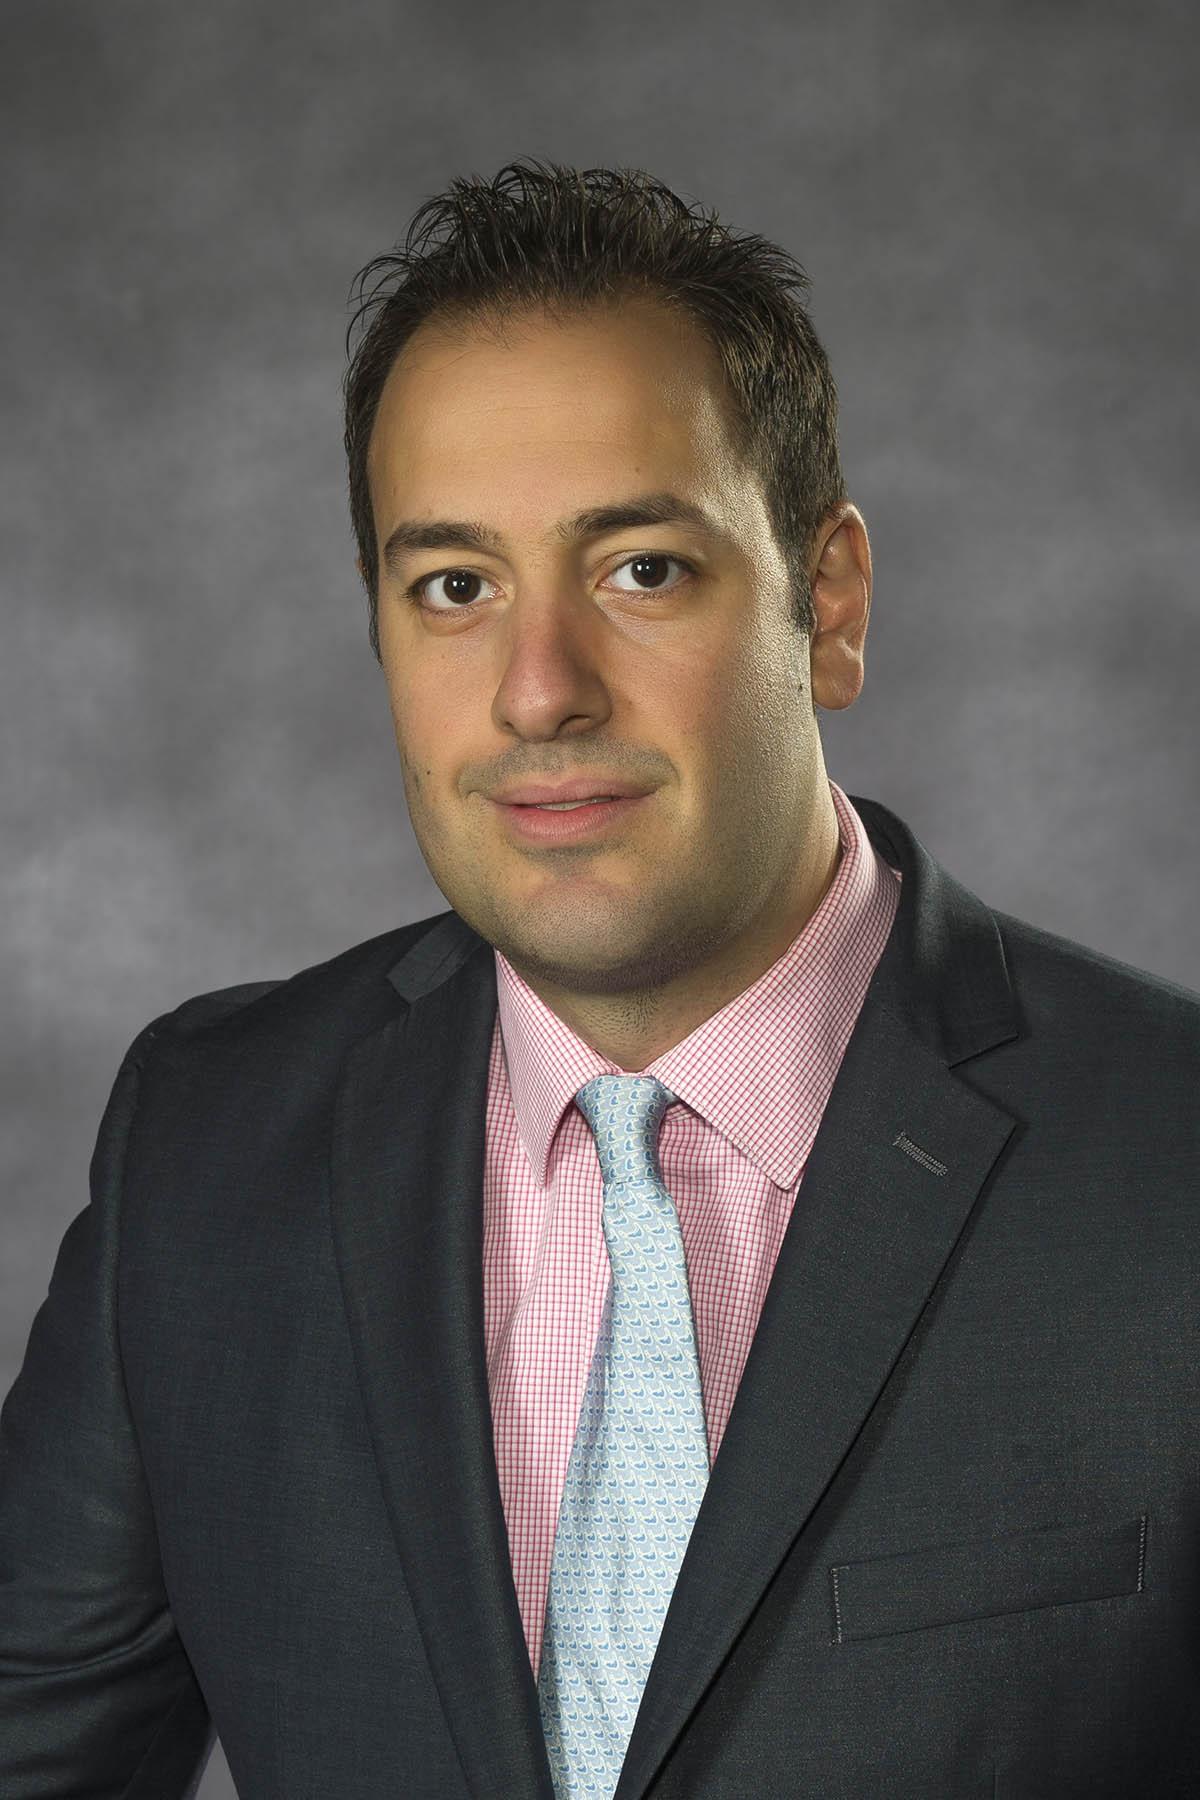 Anthony Faber, Ph.D., Virginia Commonwealth University